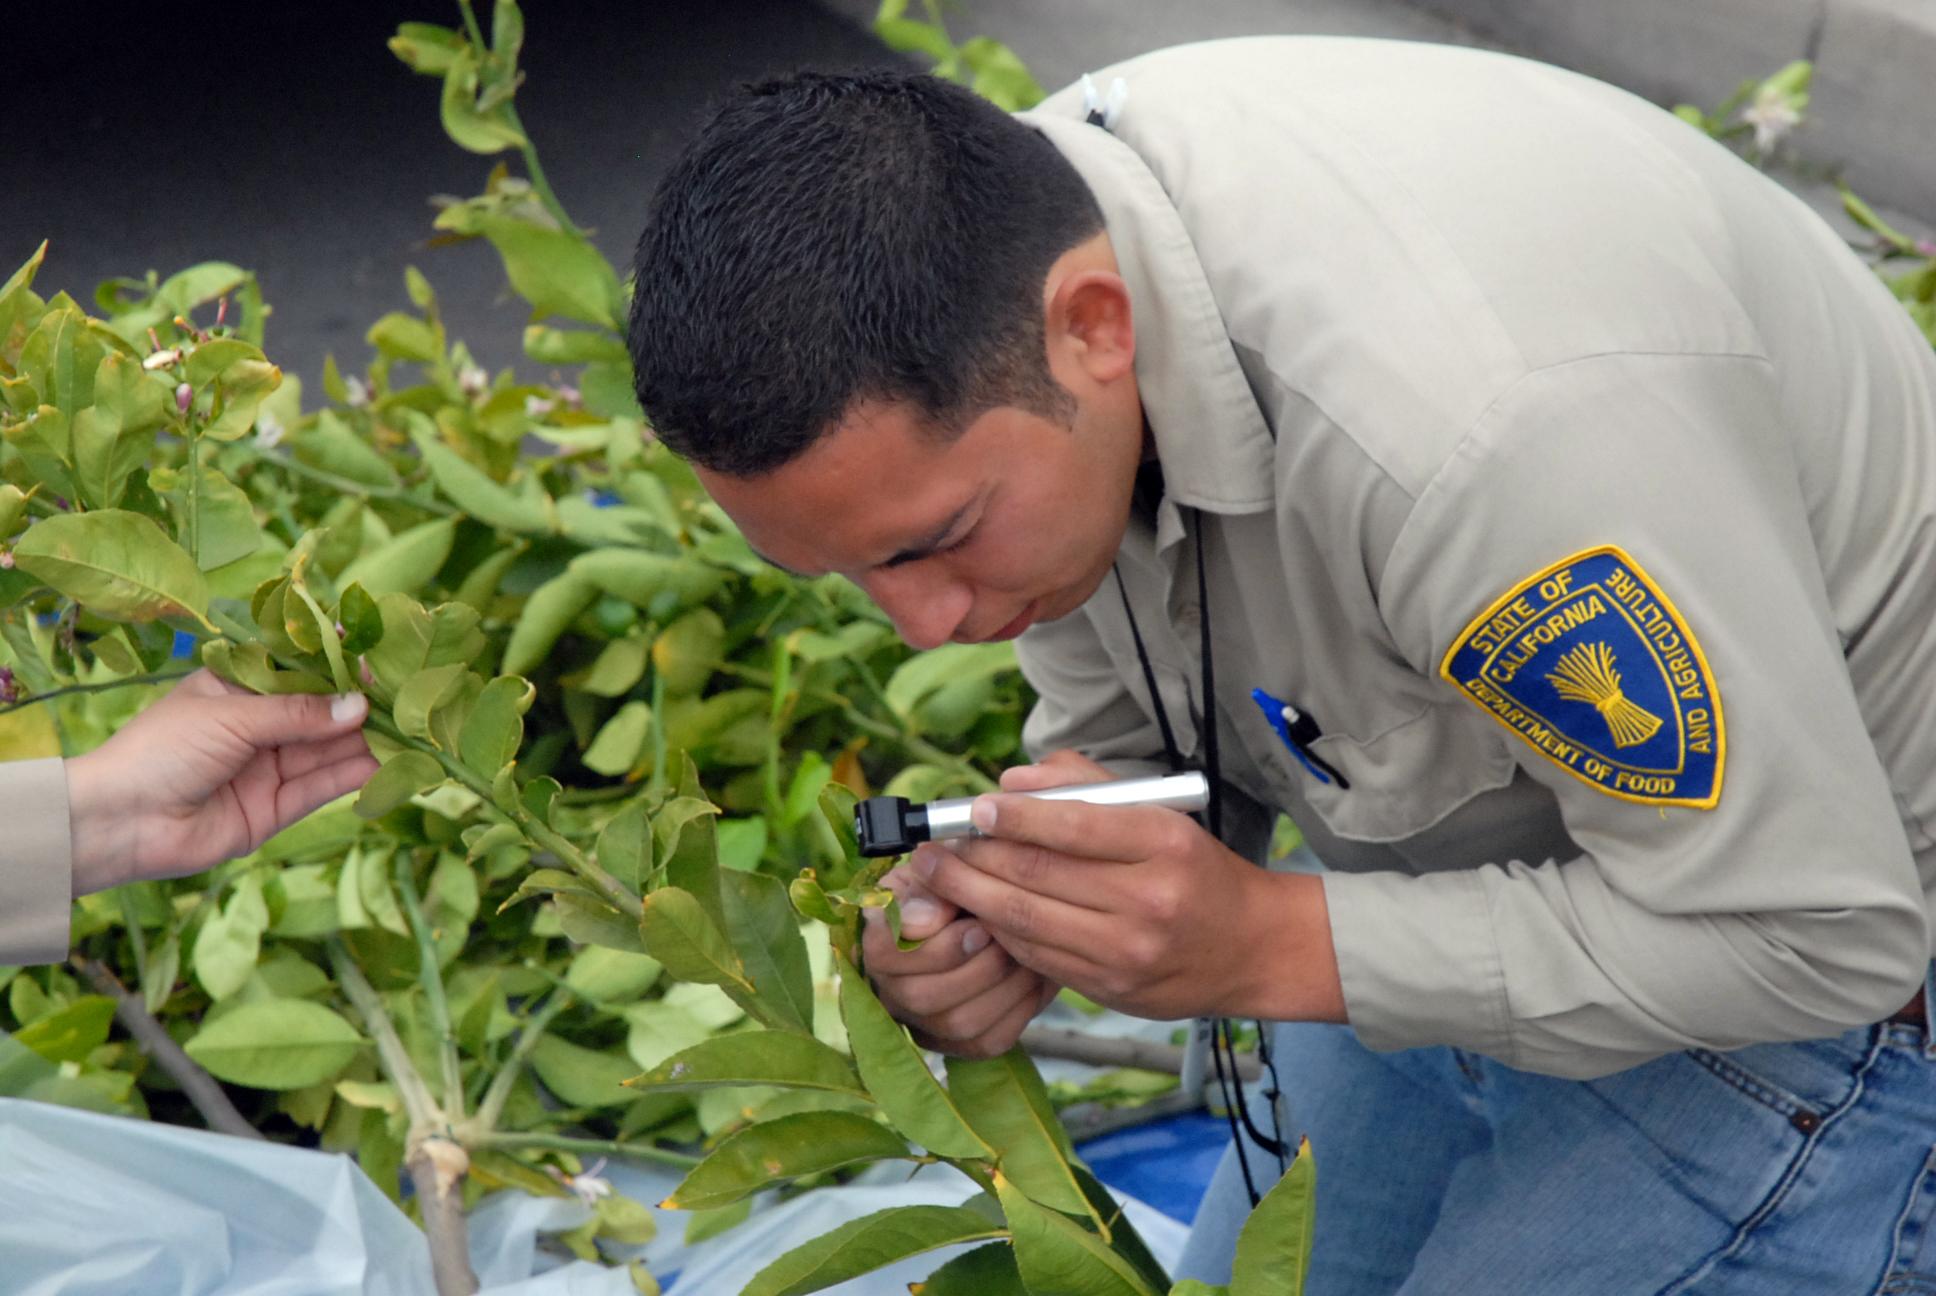 Alex Muniz, Senior Environmental Scientist, Supervisor, Inspecting citrus leave for Asian citrus psyllid